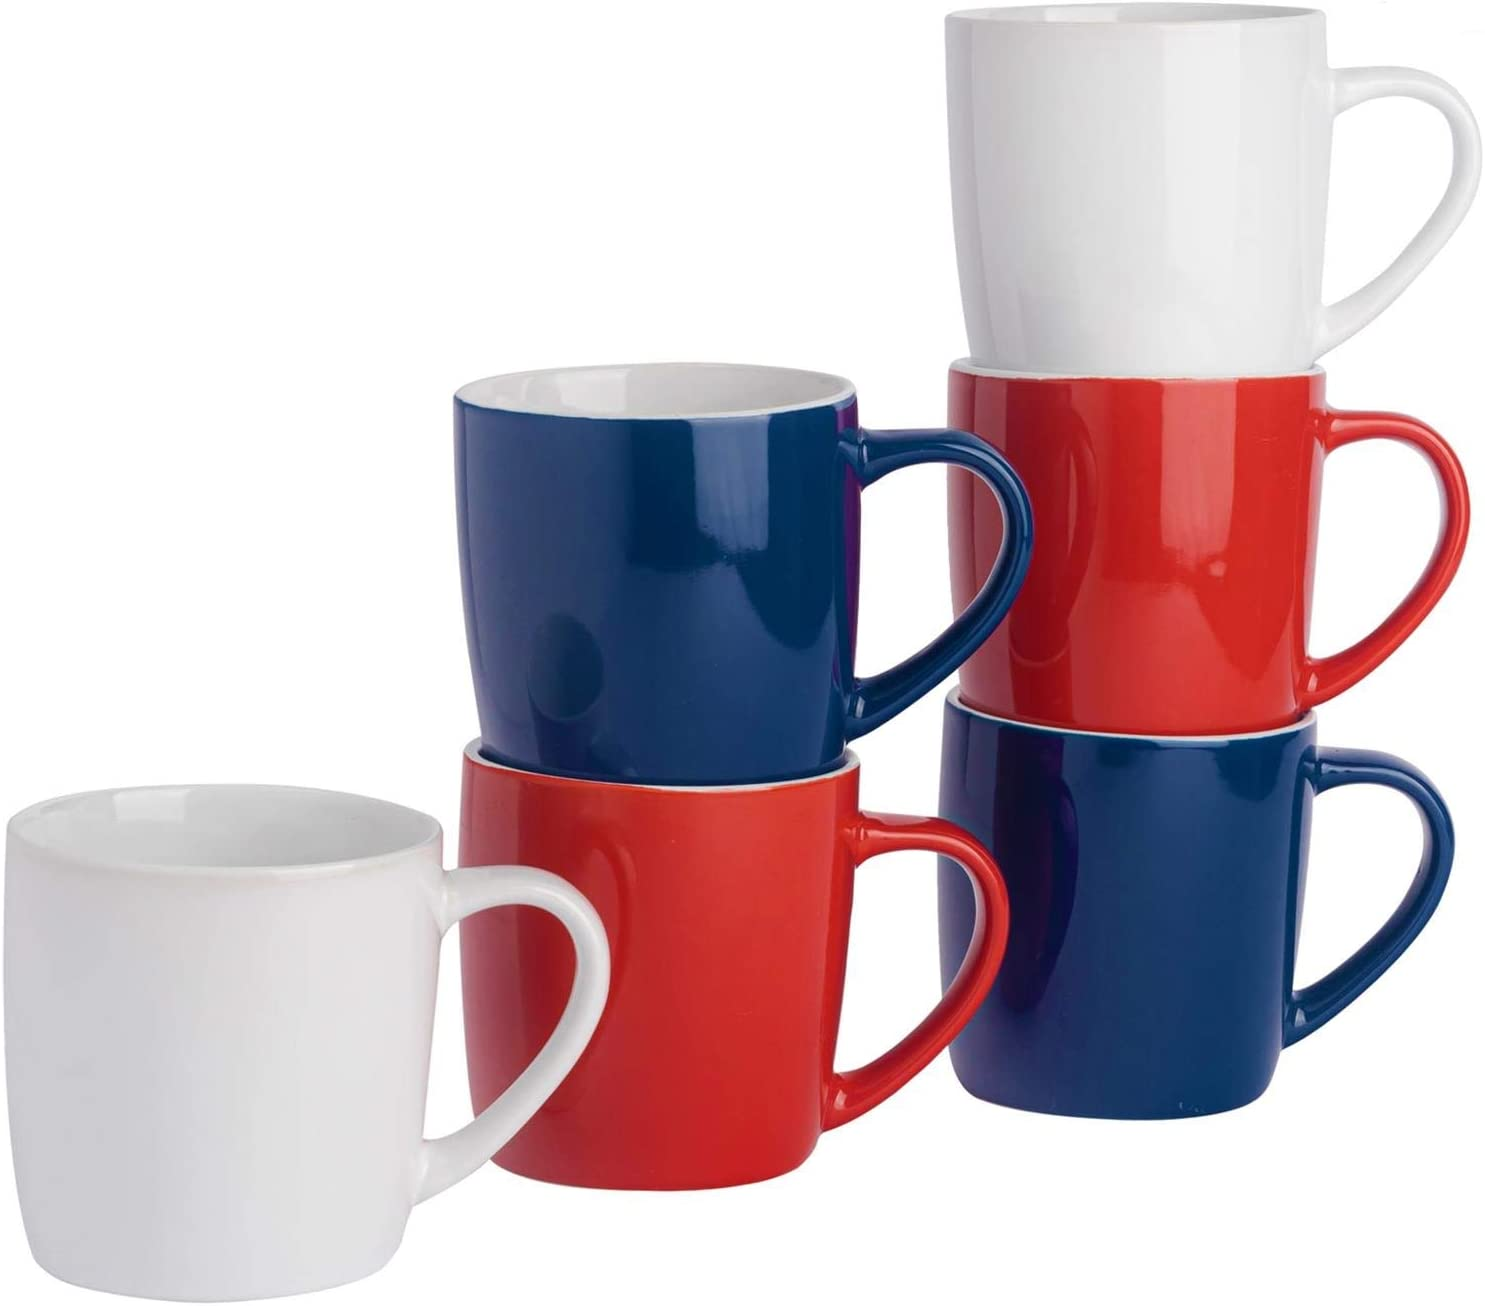 Max 79% OFF Argon Tableware In a popularity Tea Coffee Mugs Coloured Contemporary - Cera 6pc